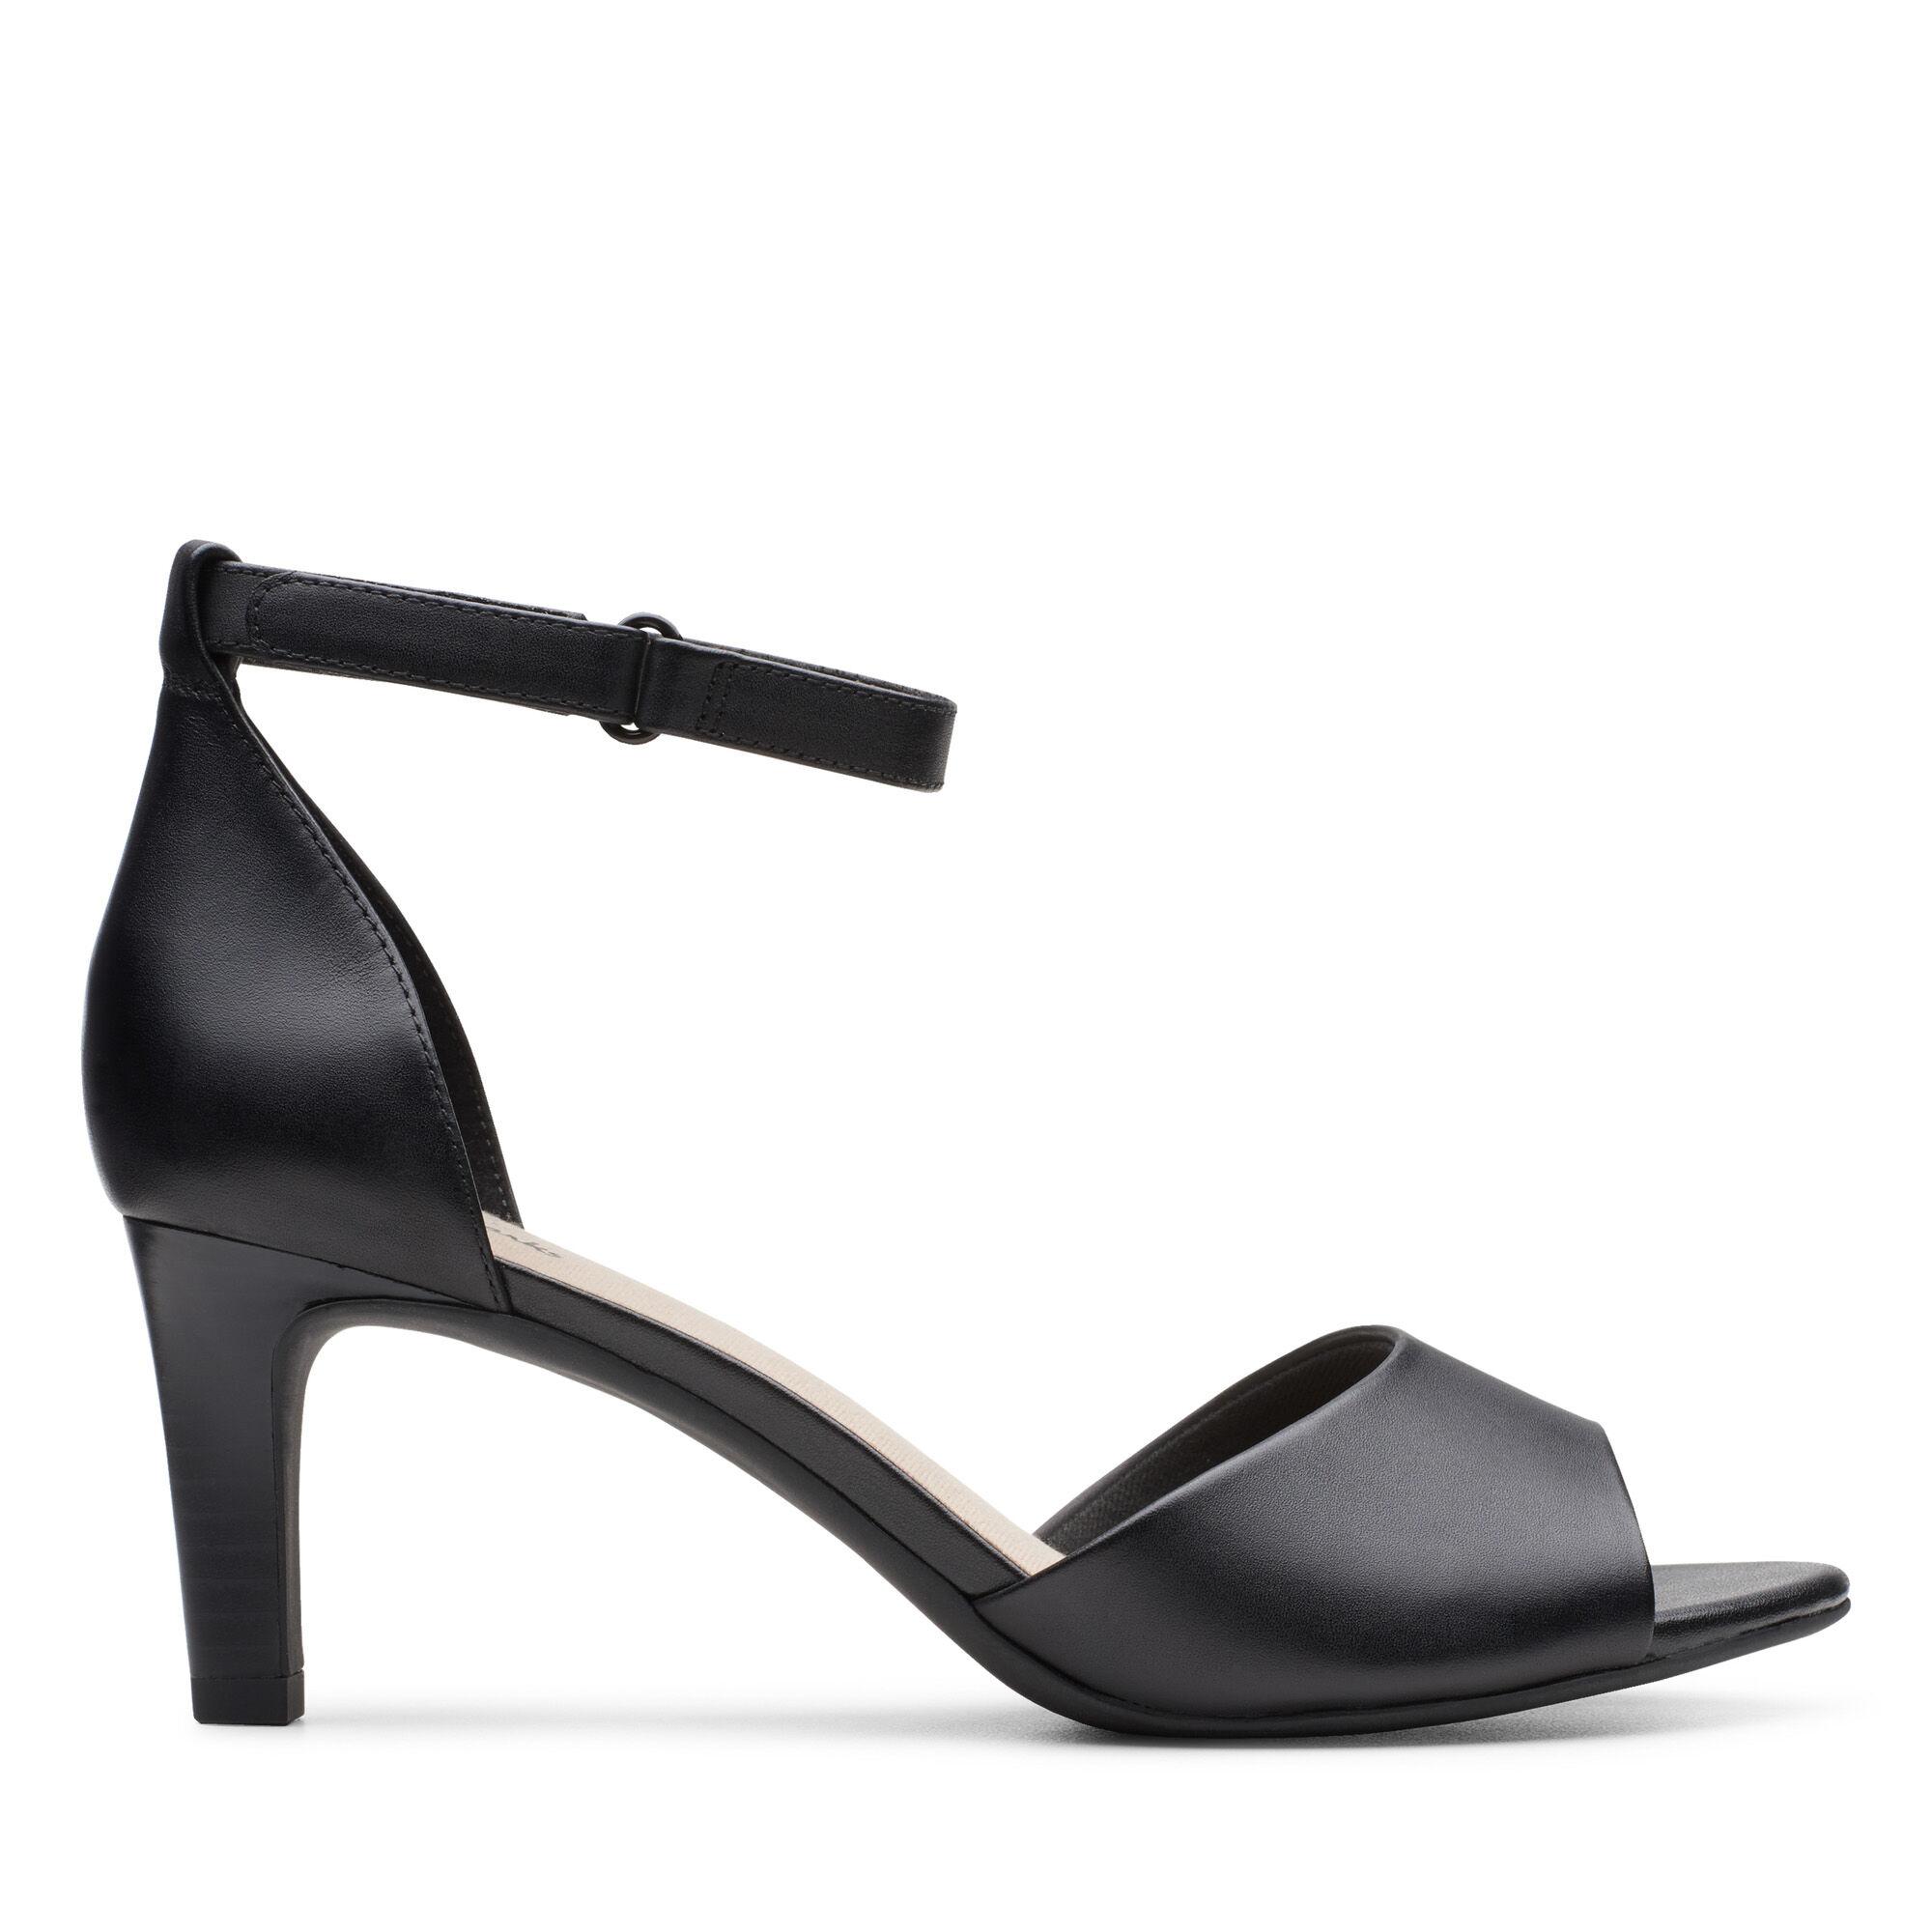 Women's Black Leather Pumps Alice Greta | Clarks